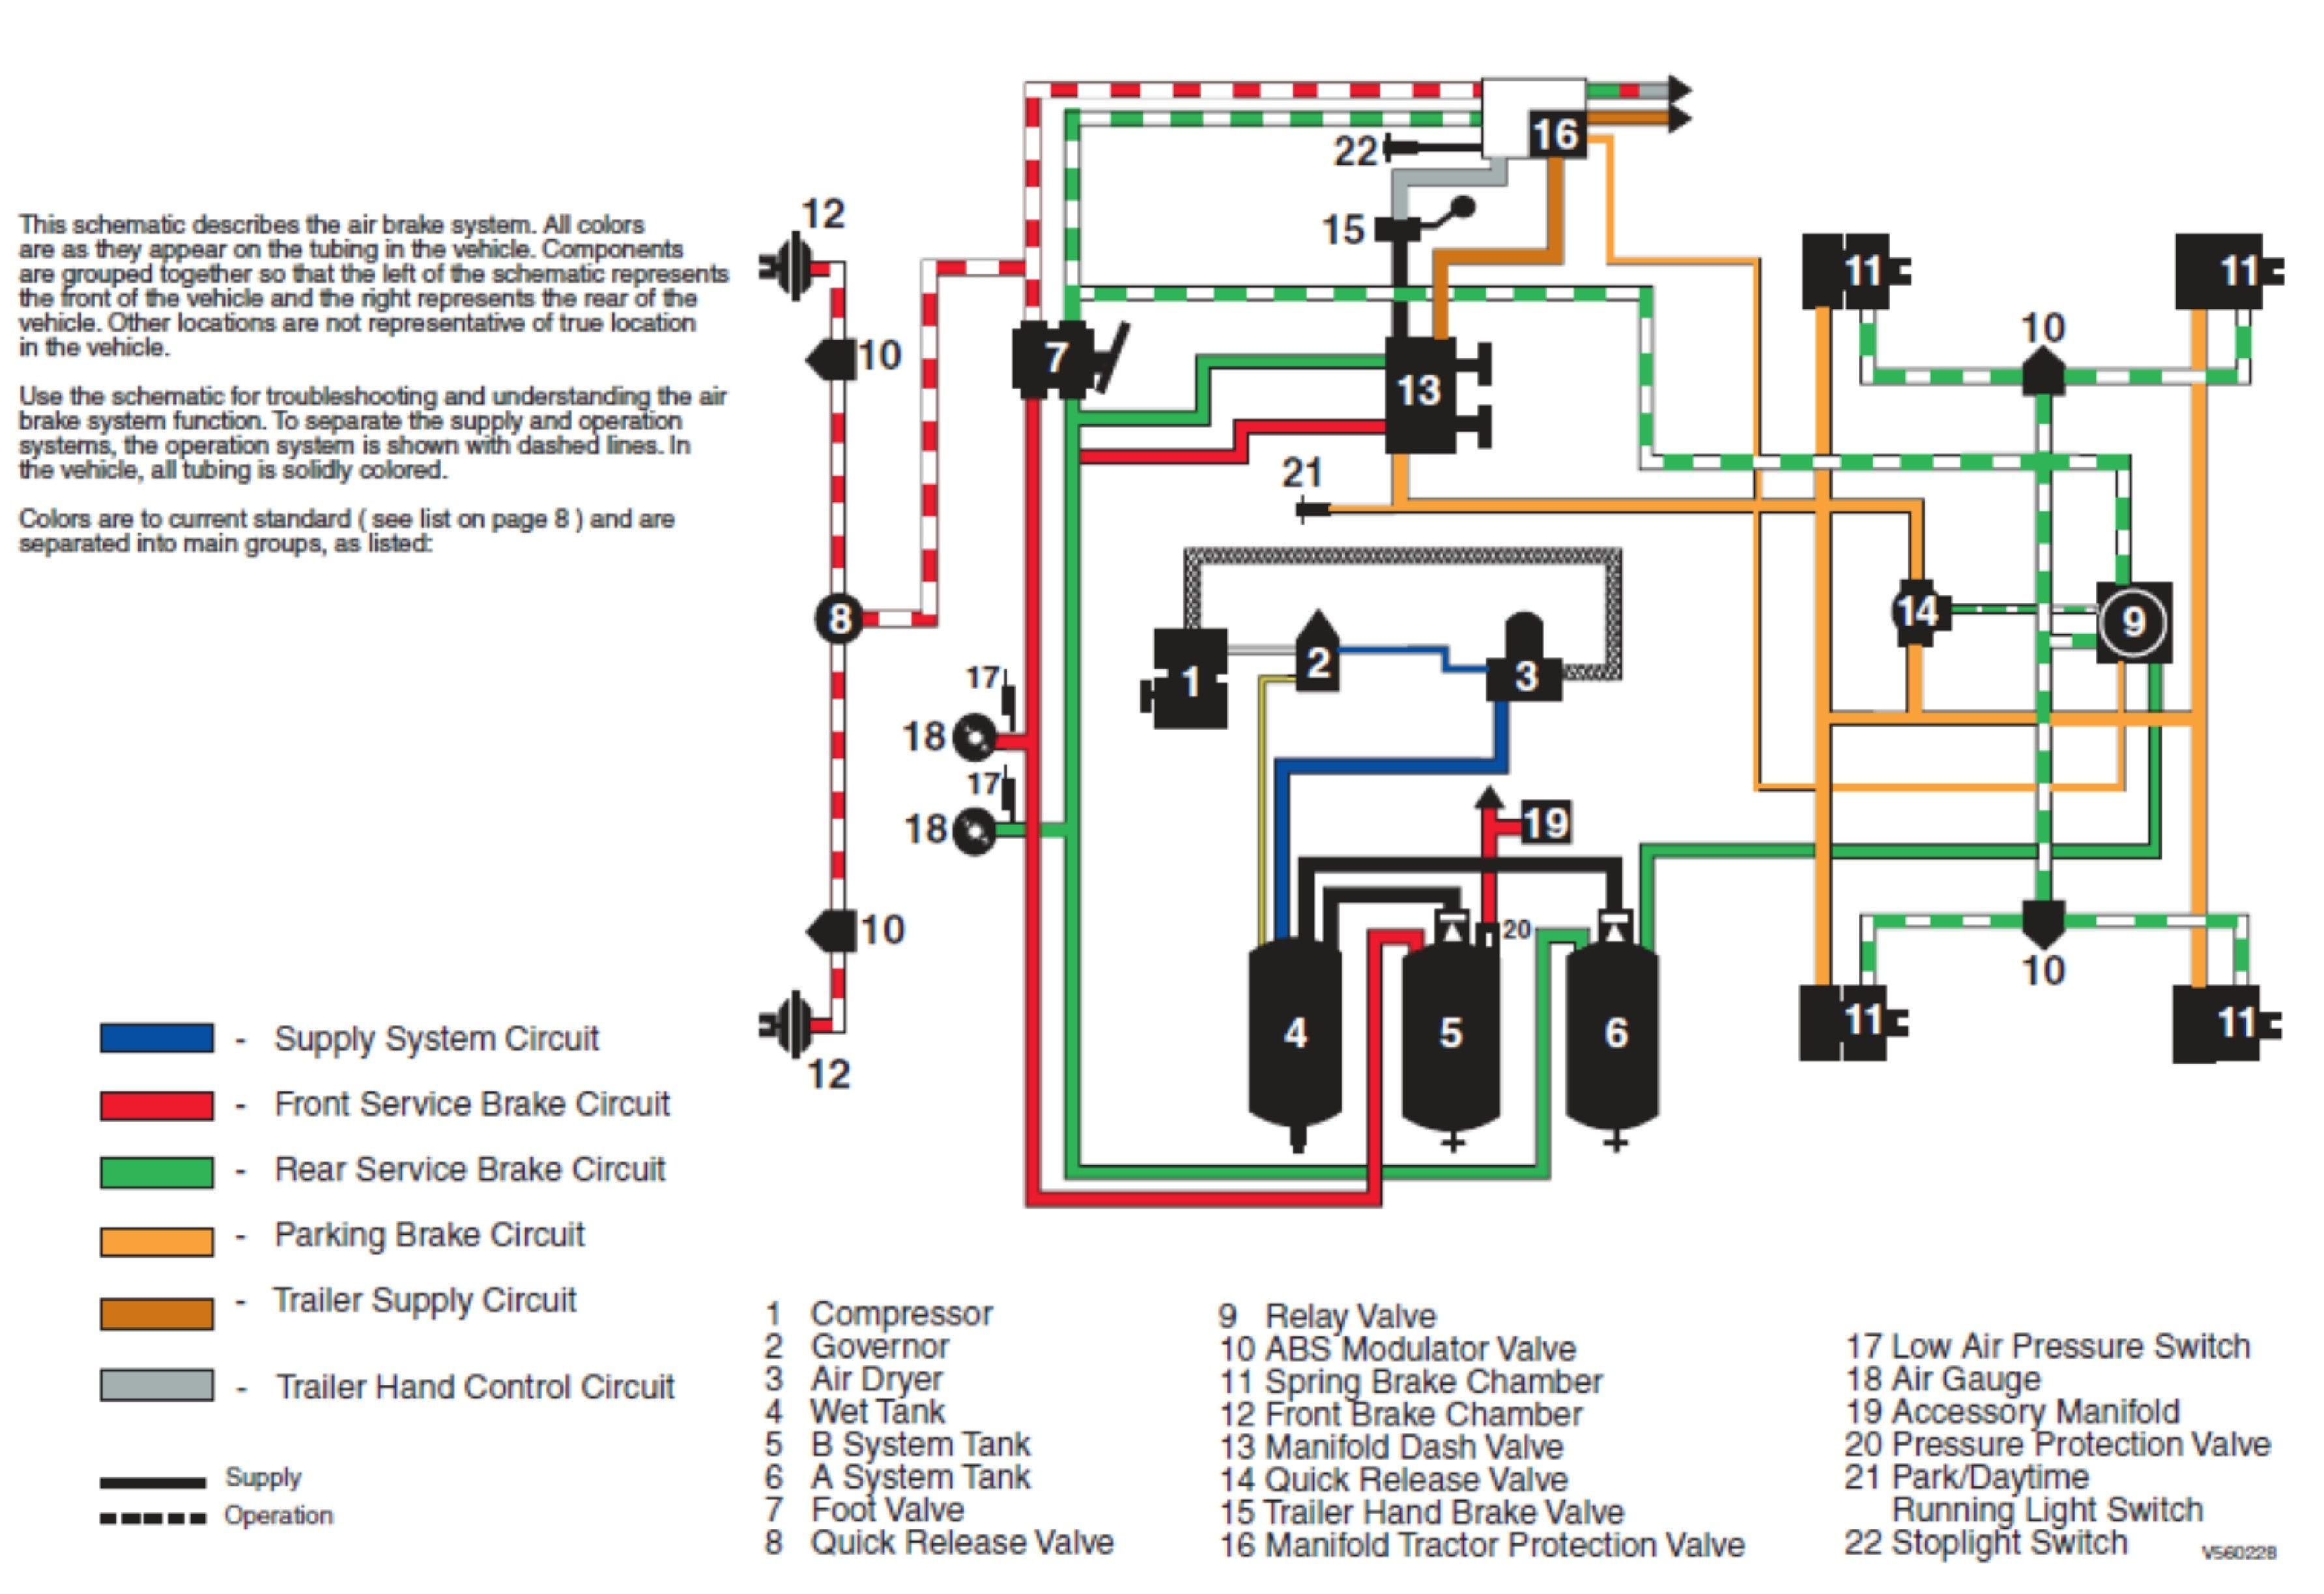 Brake Chamber Diagram Tractor Trailer Air Brake System Diagram Of Brake Chamber Diagram